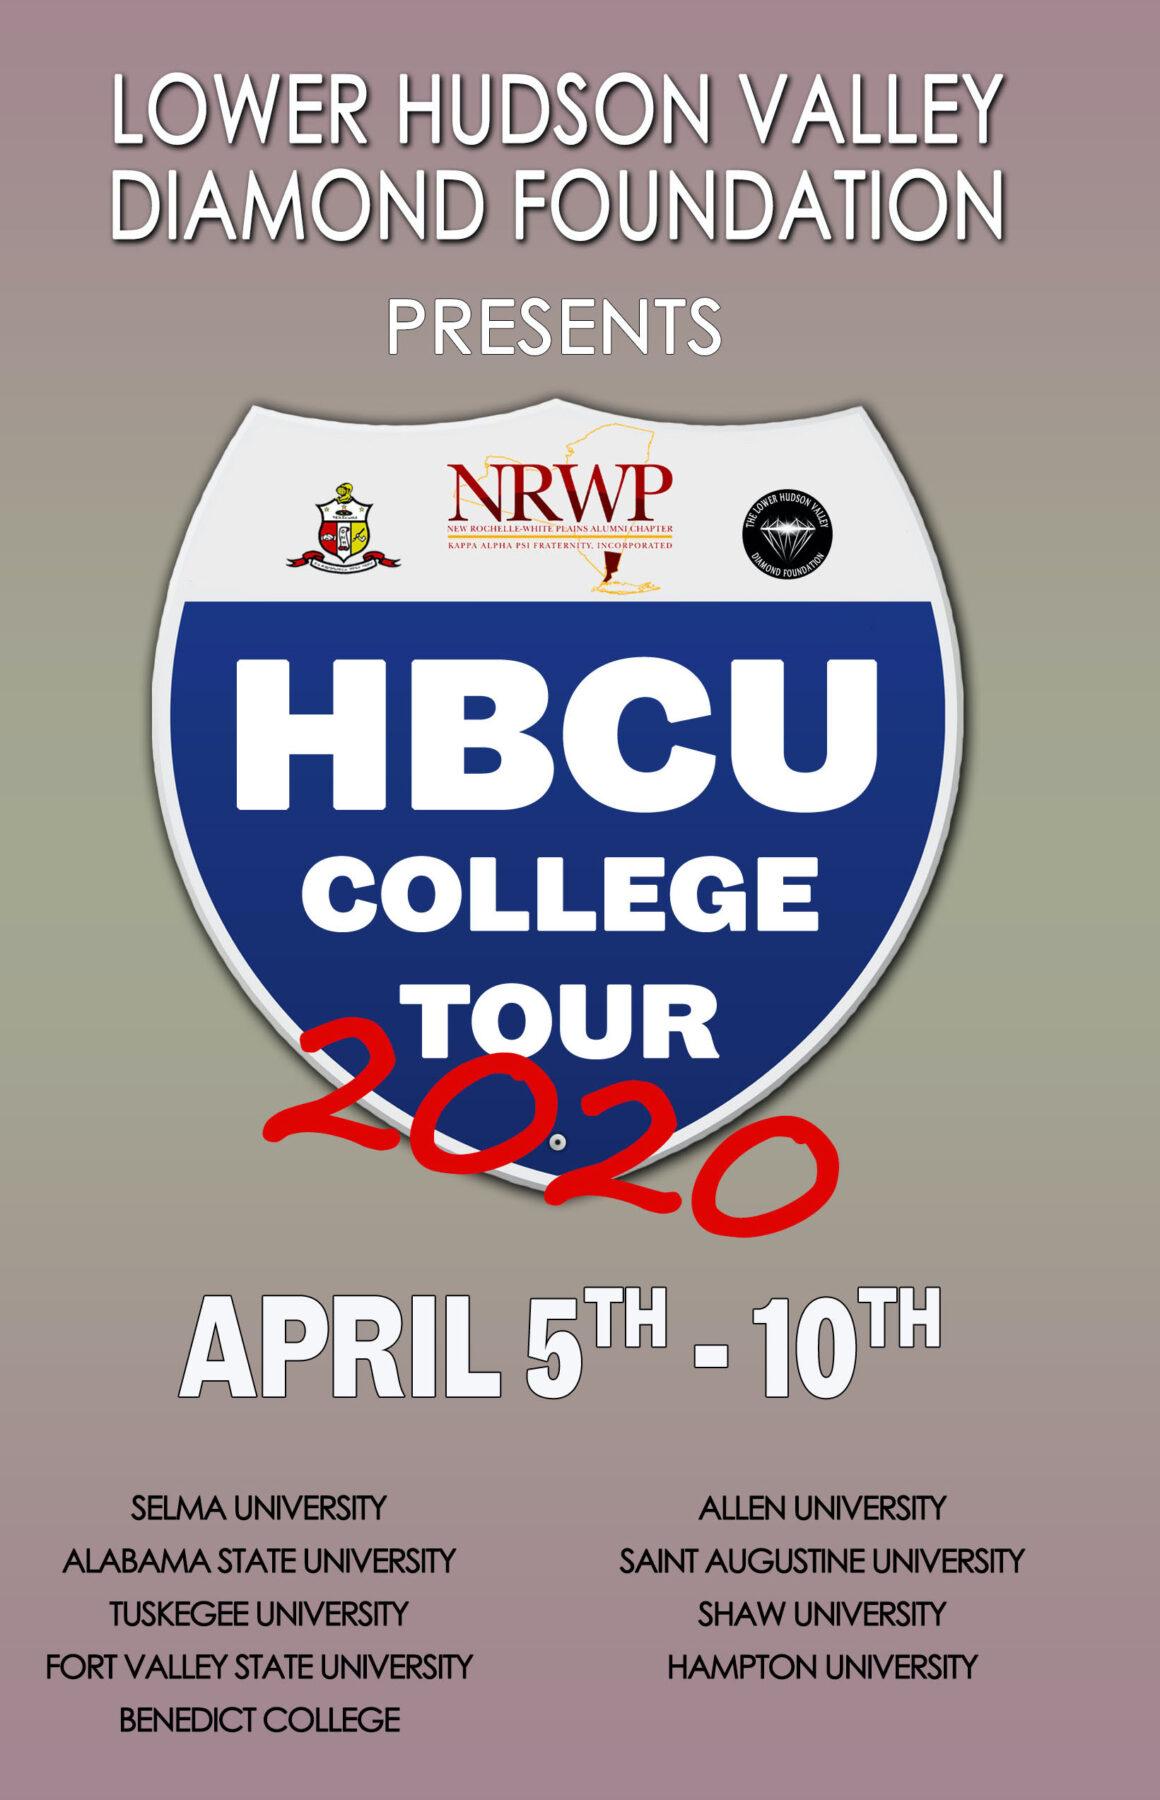 HBCU College Tour Flyer